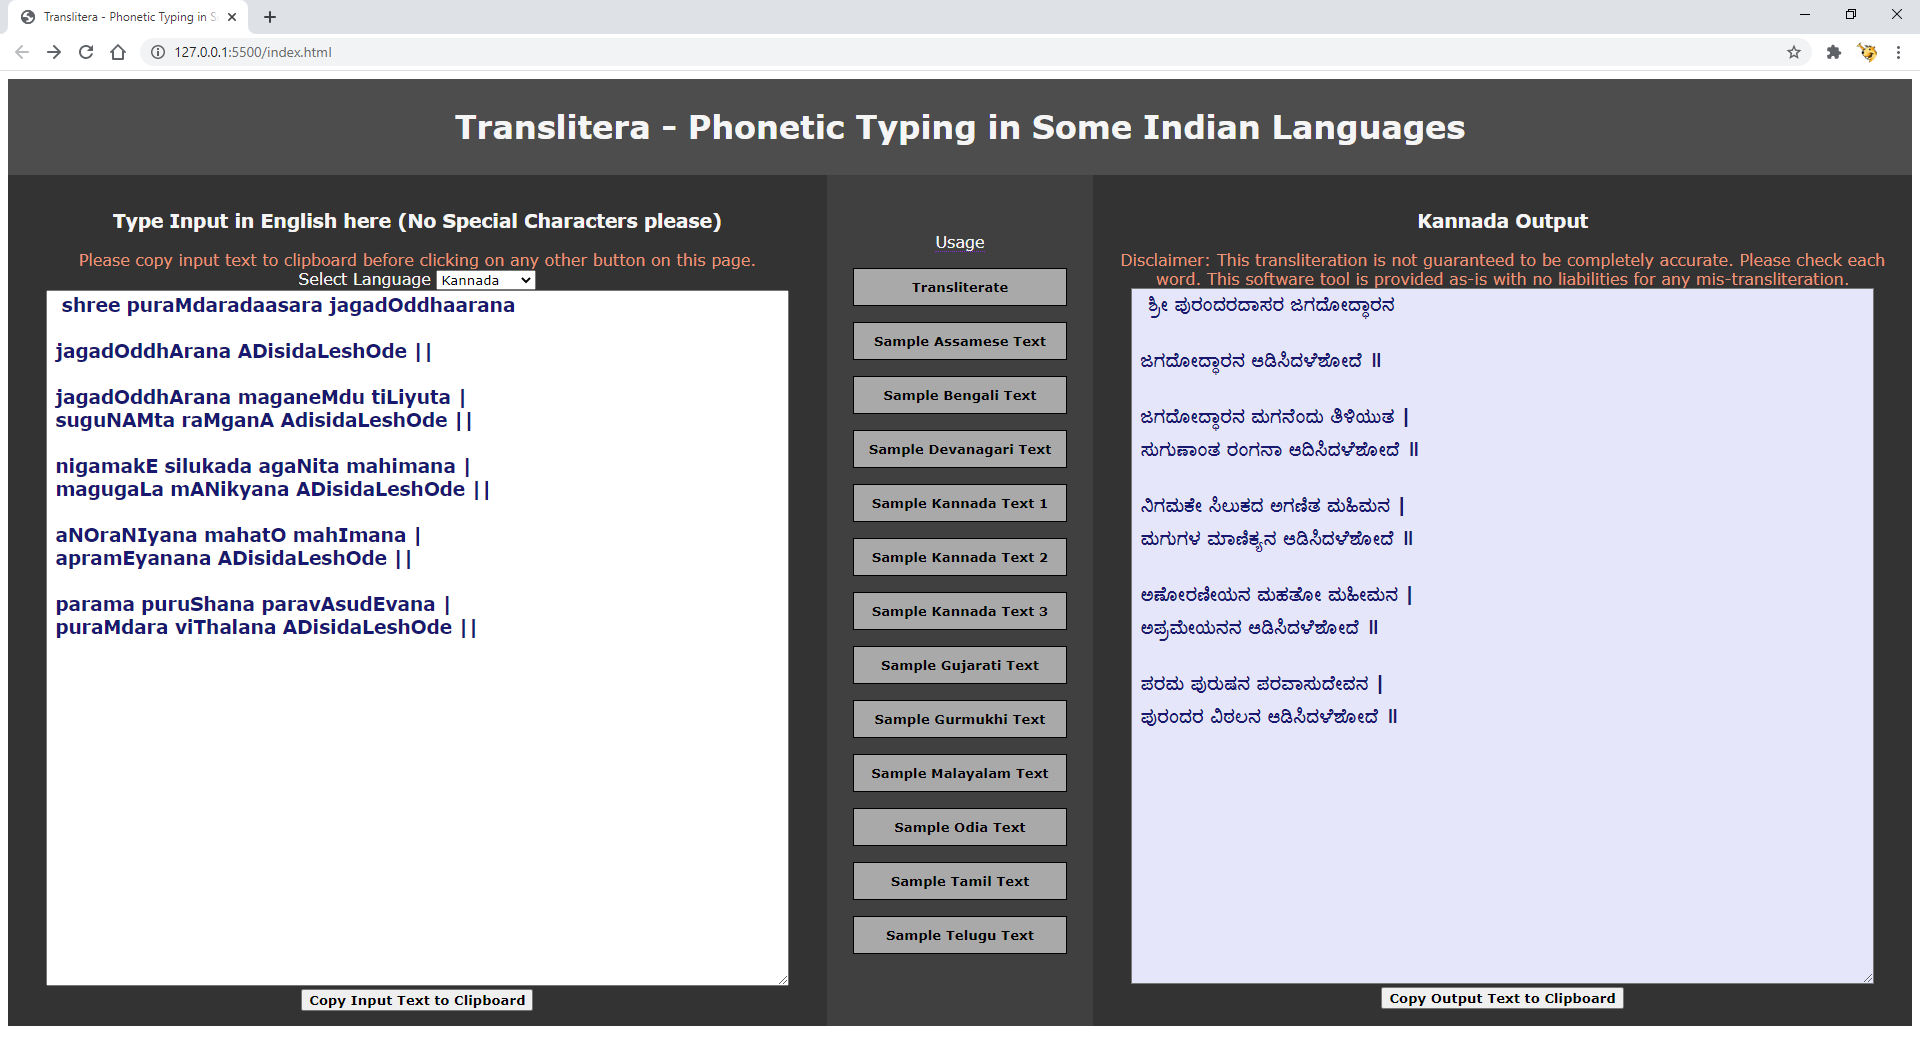 Image of Translitera